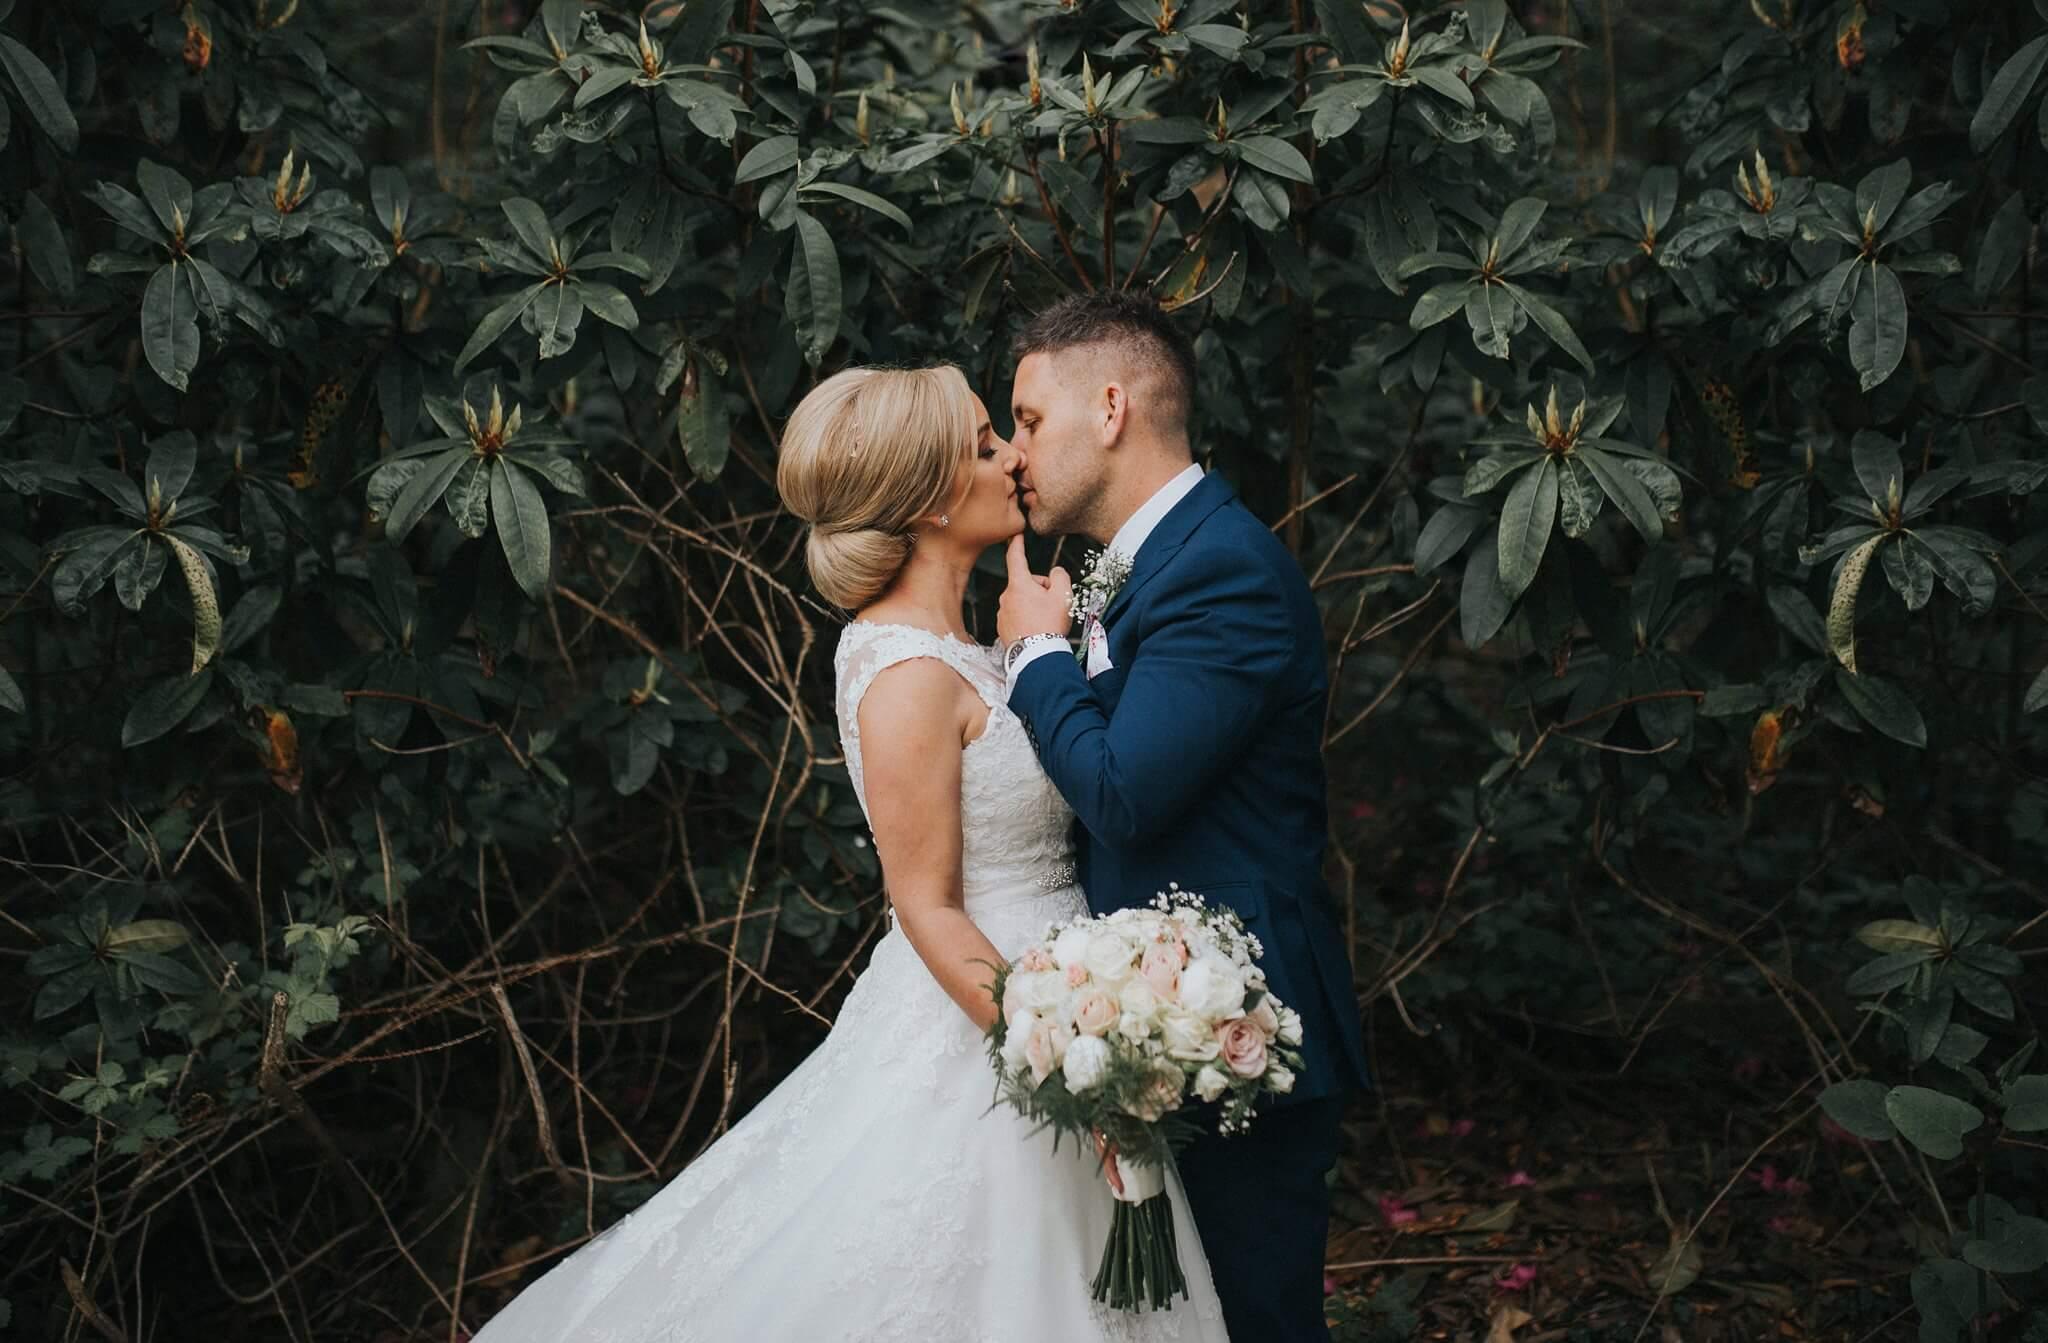 wedding-photographer-and-videographer-bryngarw-house-brynmenyn-bridgend-uk-03